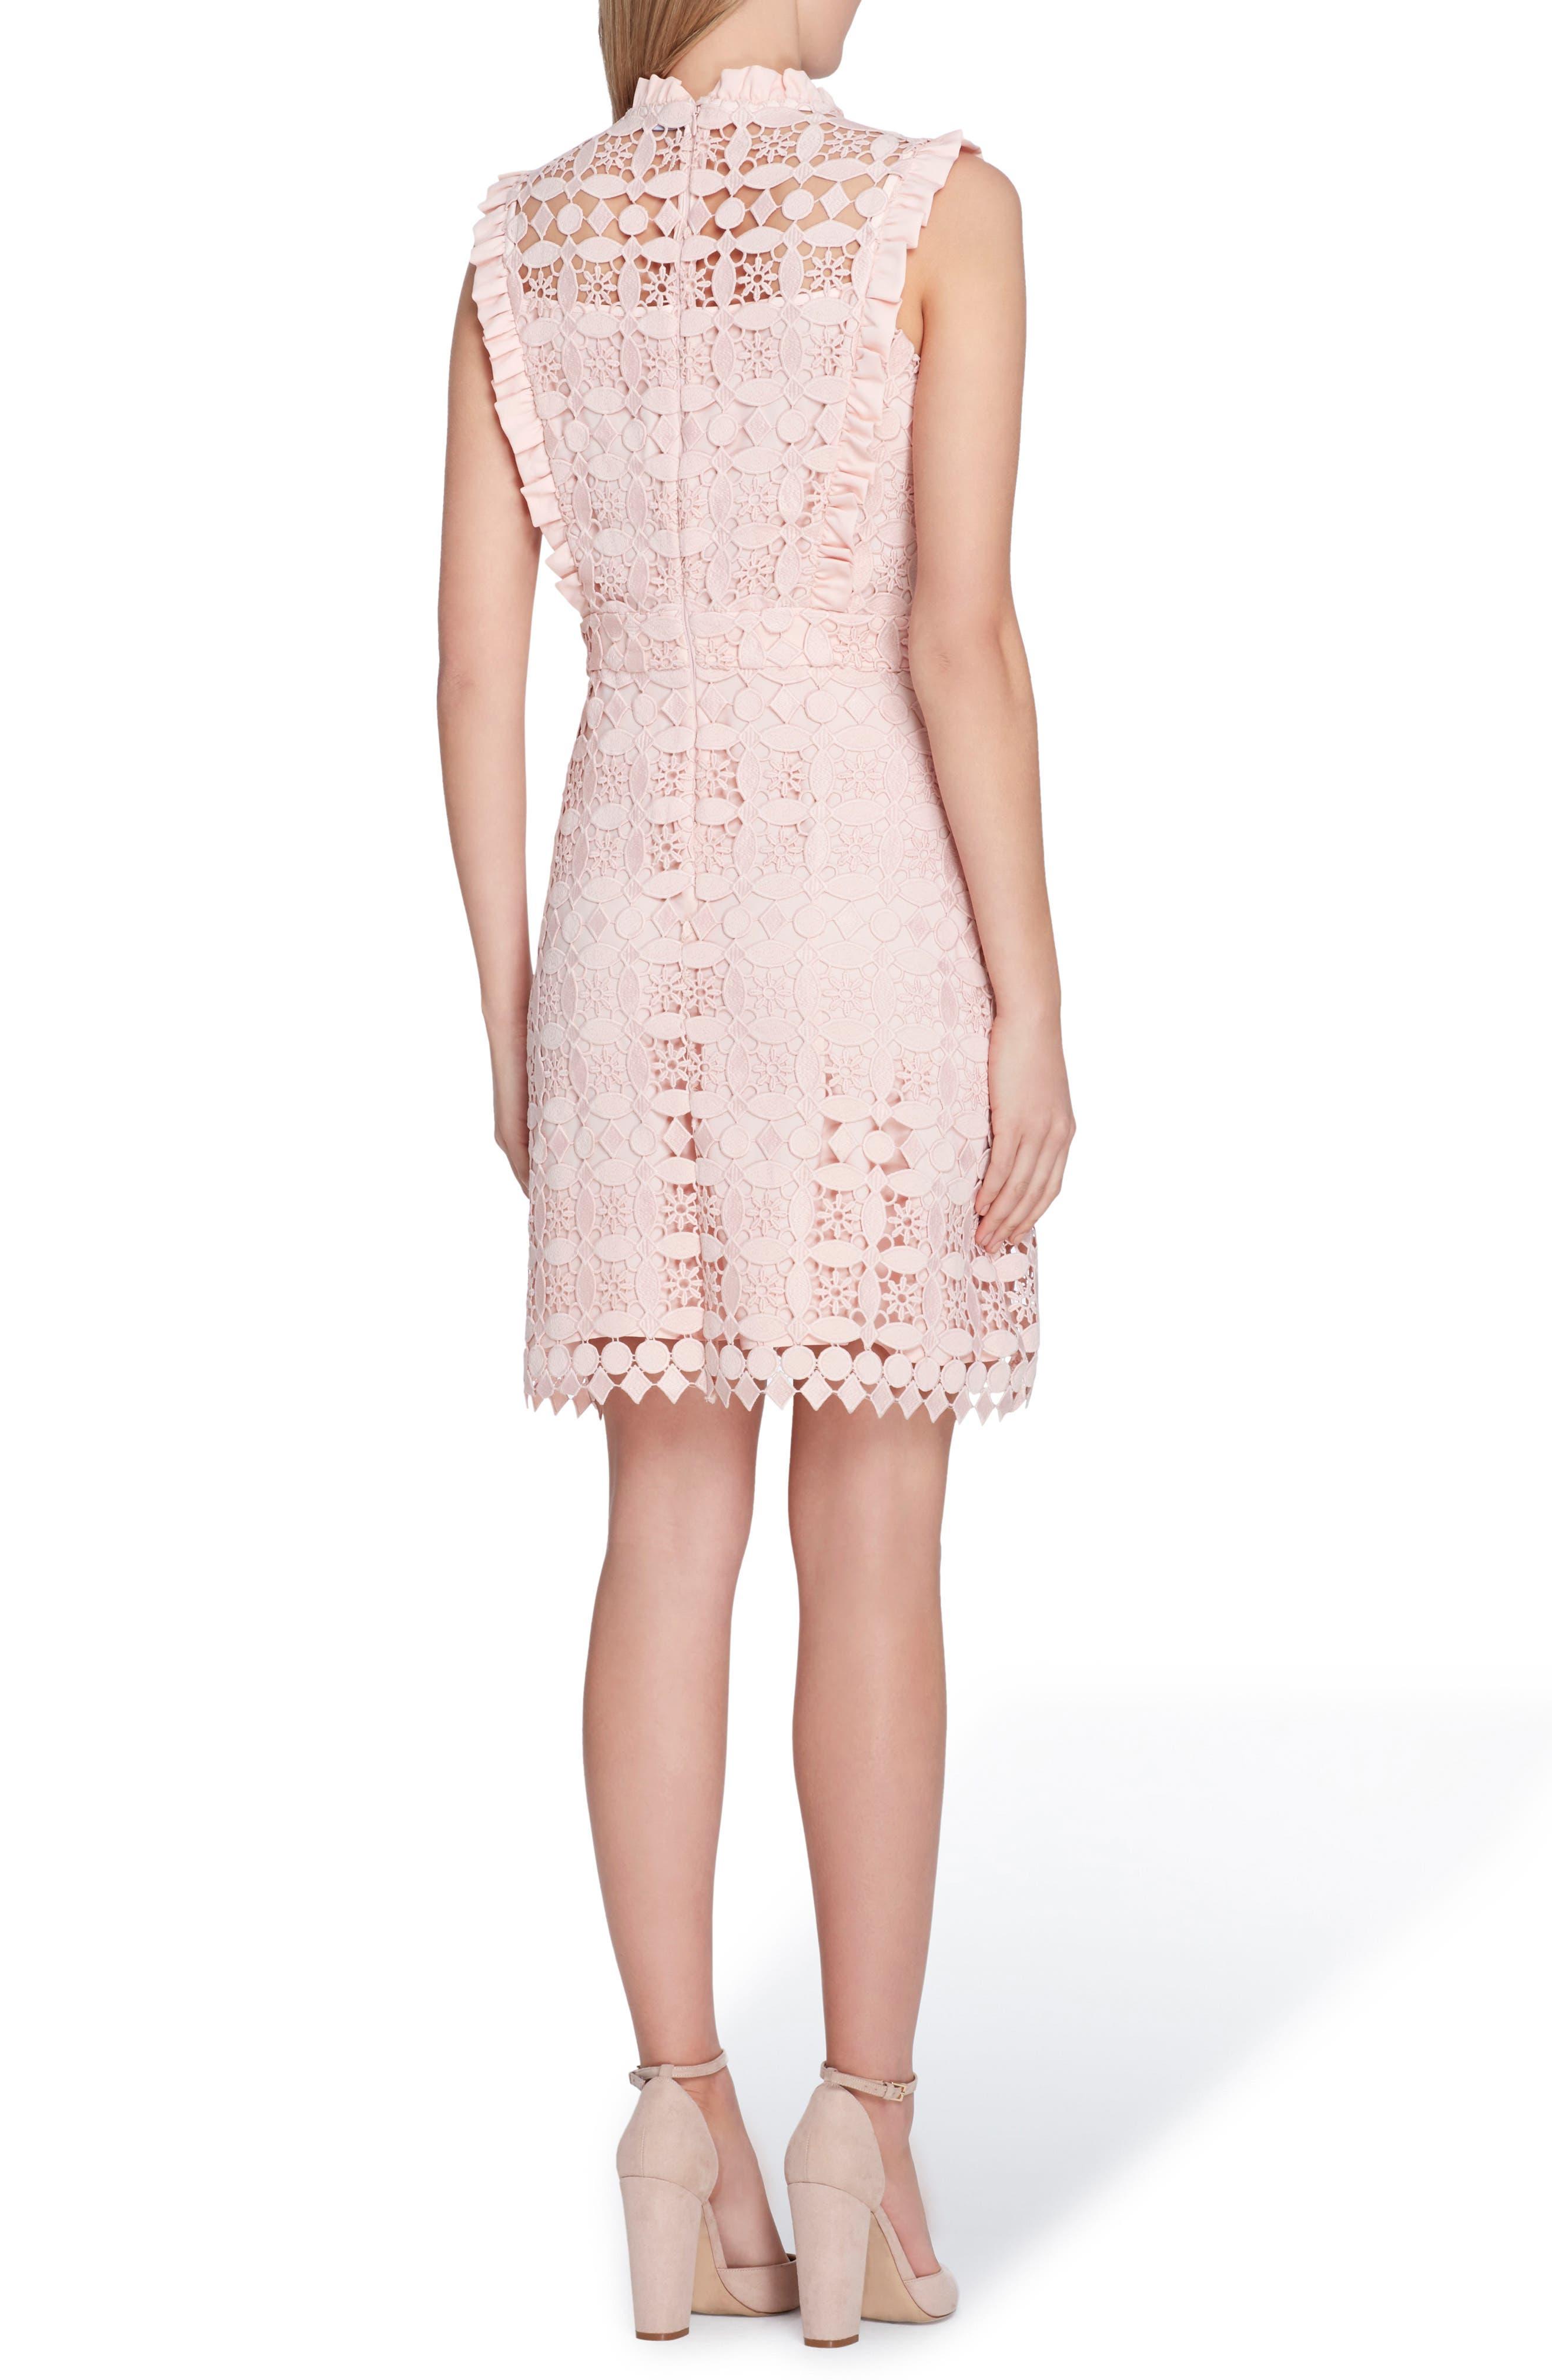 TAHARI,                             High Neck Lace Sheath Dress,                             Alternate thumbnail 2, color,                             672